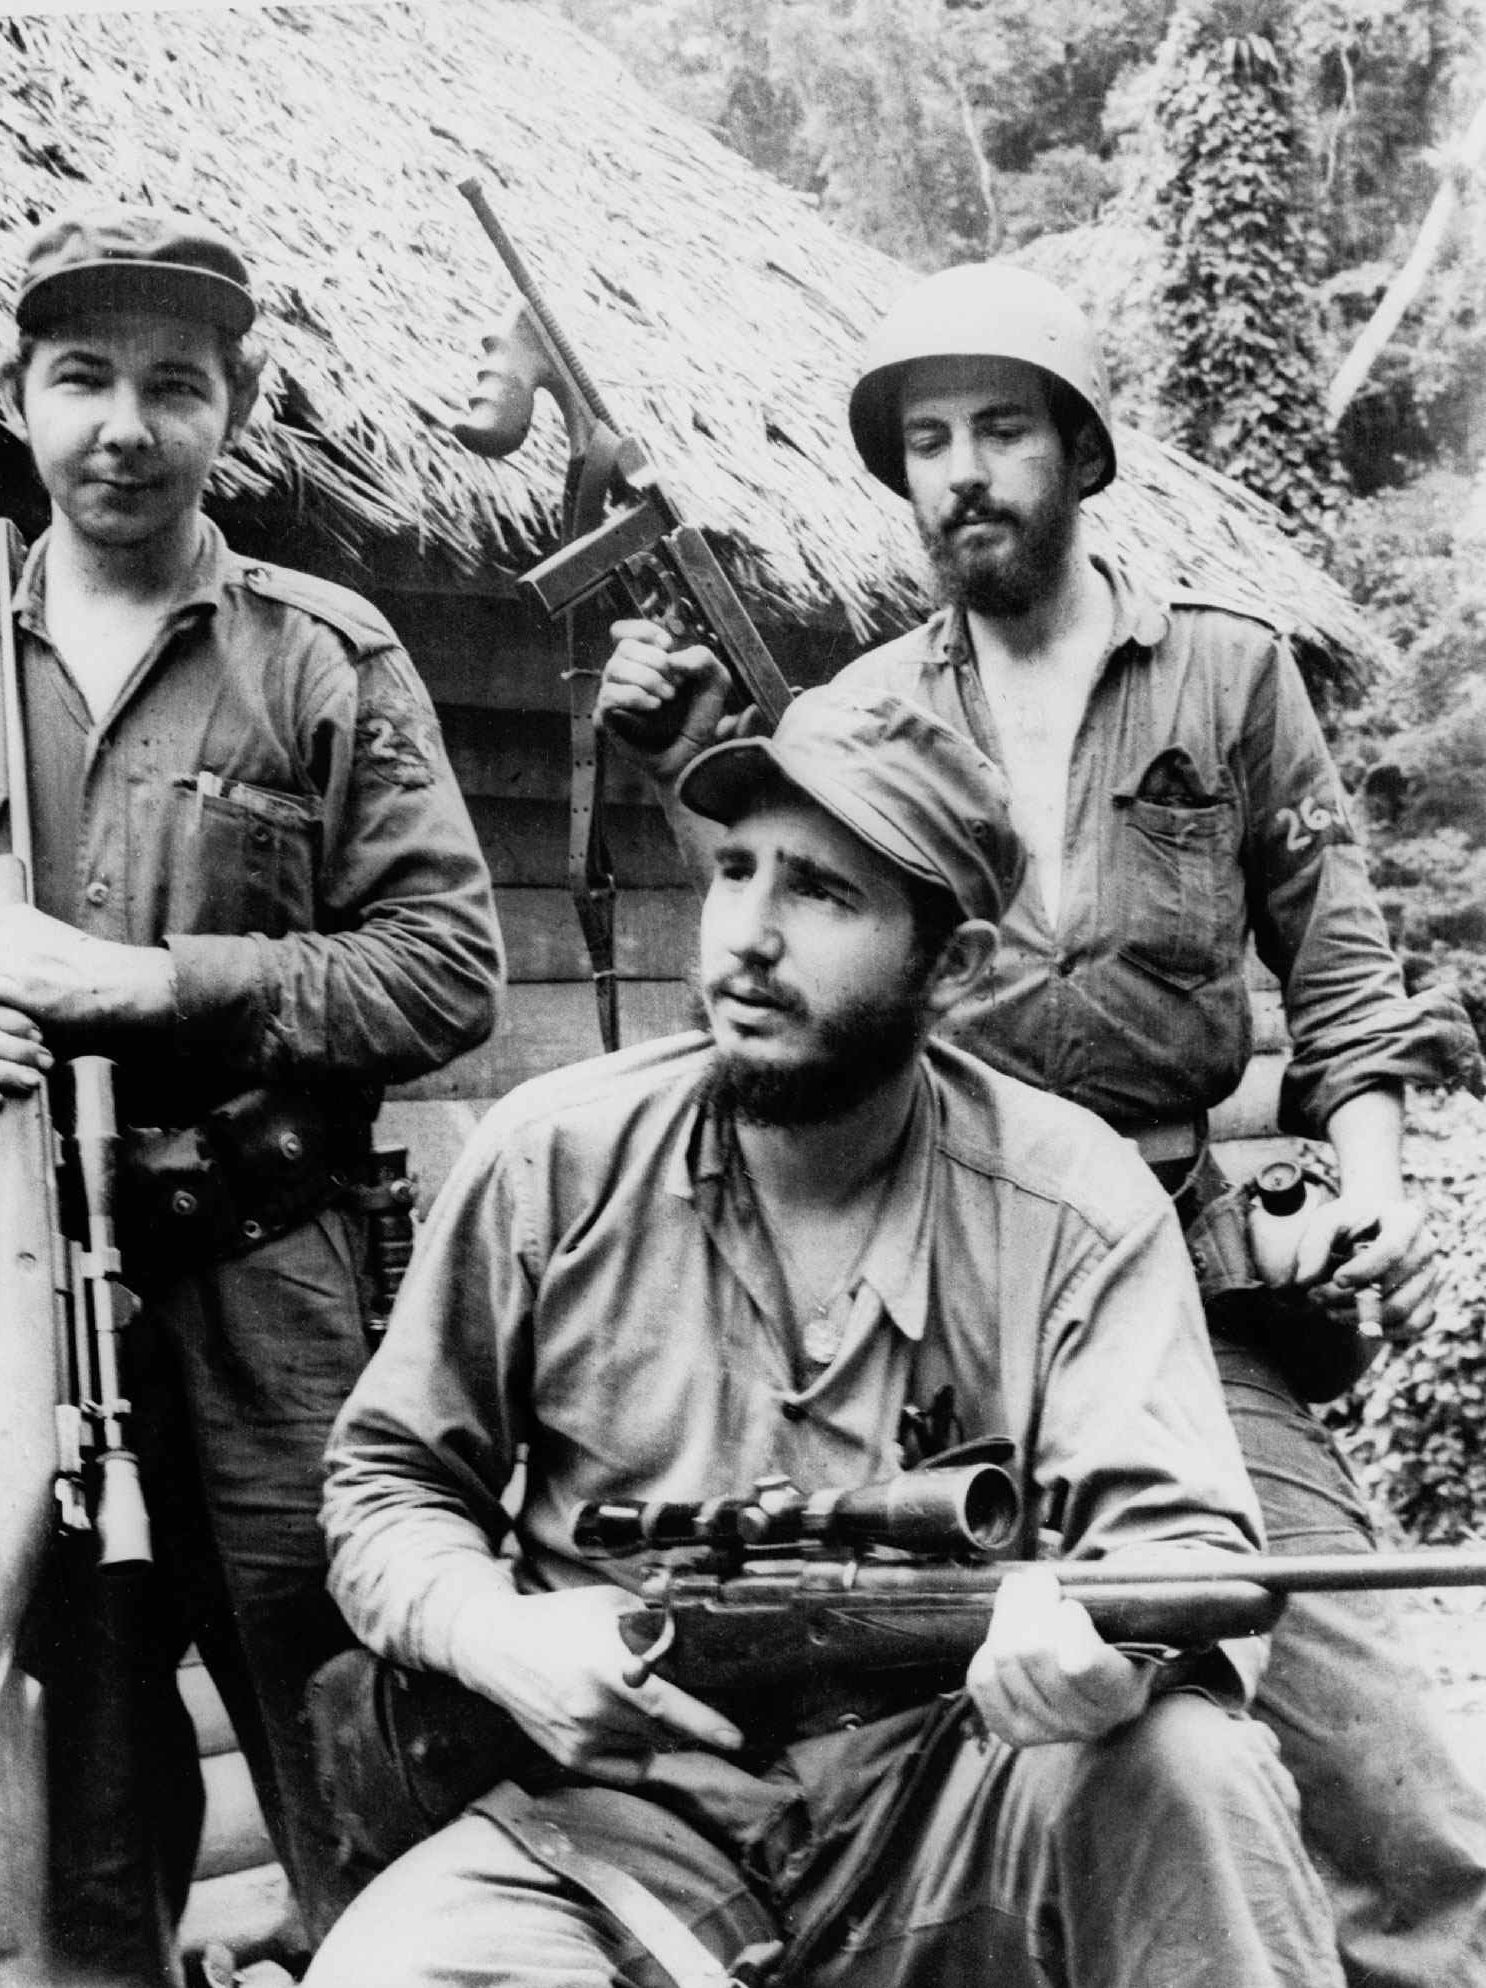 fidel castros attitude towards the bay of pigs invasion On january 1, 1959, a young cuban nationalist named fidel castro (1926-)  drove his guerilla army into havana and overthrew general fulgencio batista.